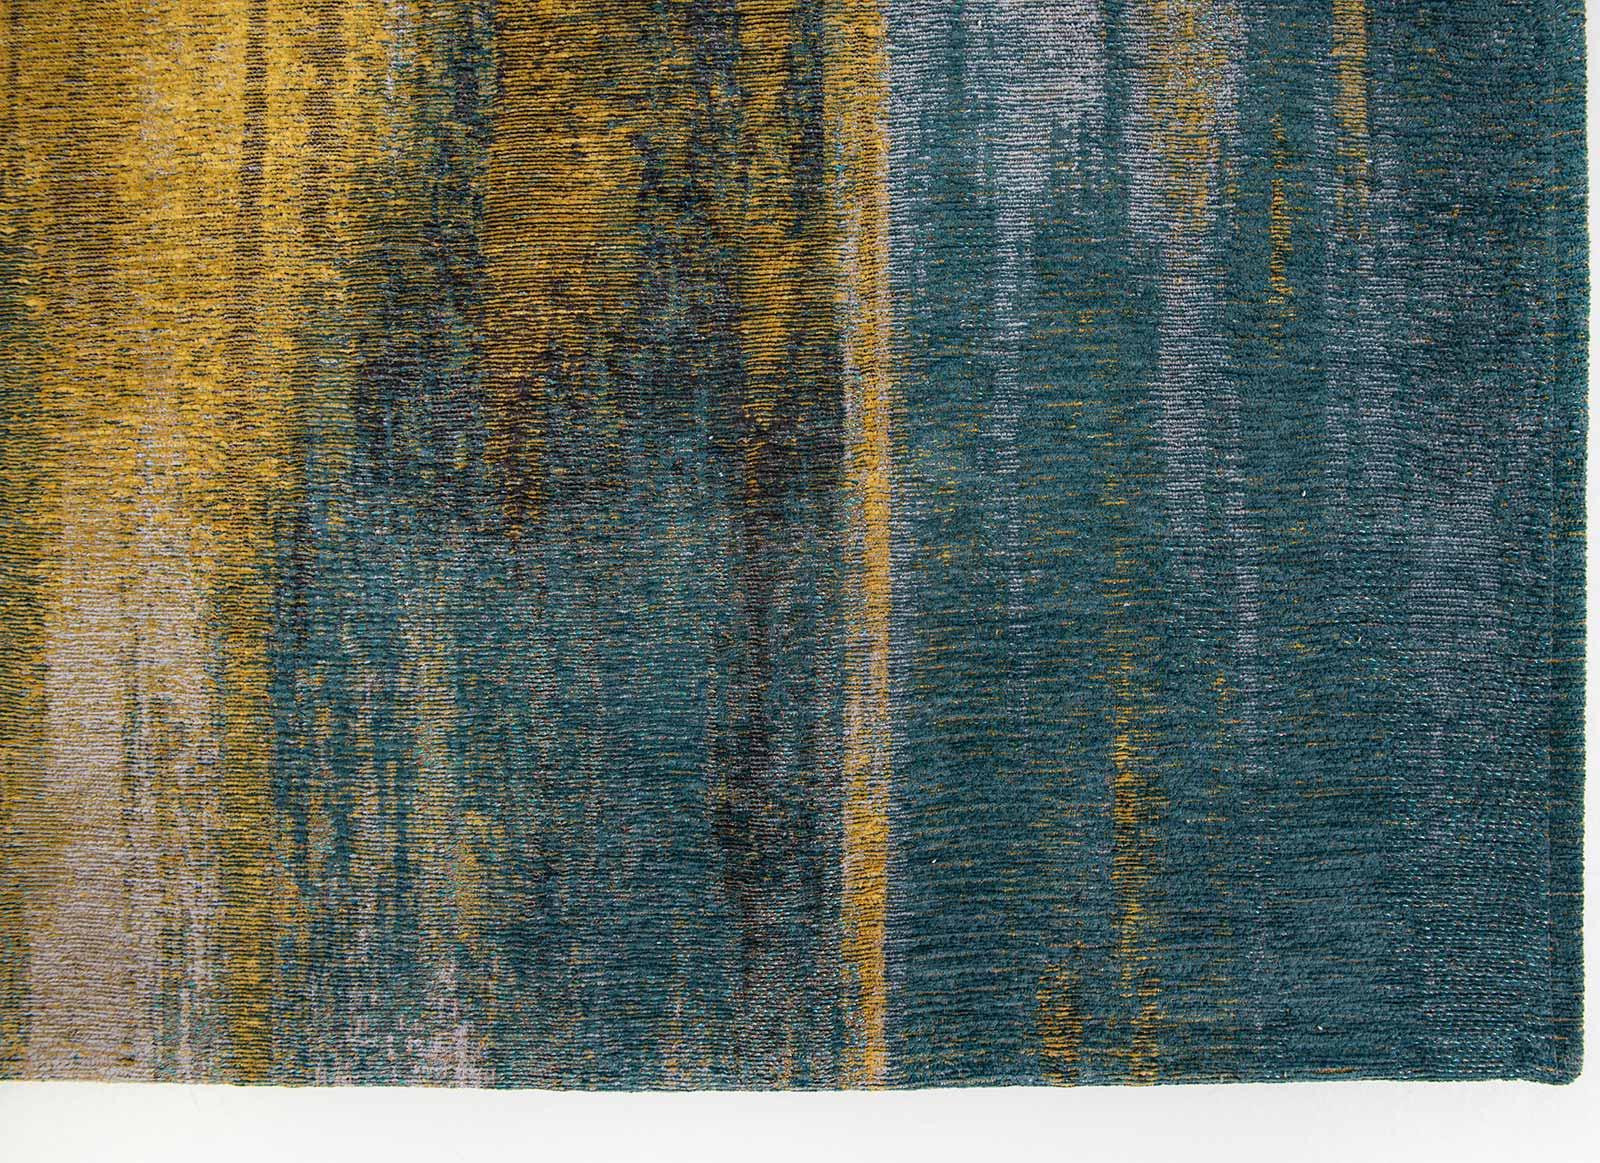 Louis De Poortere alfombra LX 9119 Atlantic Monetti Nymphea Blue corner